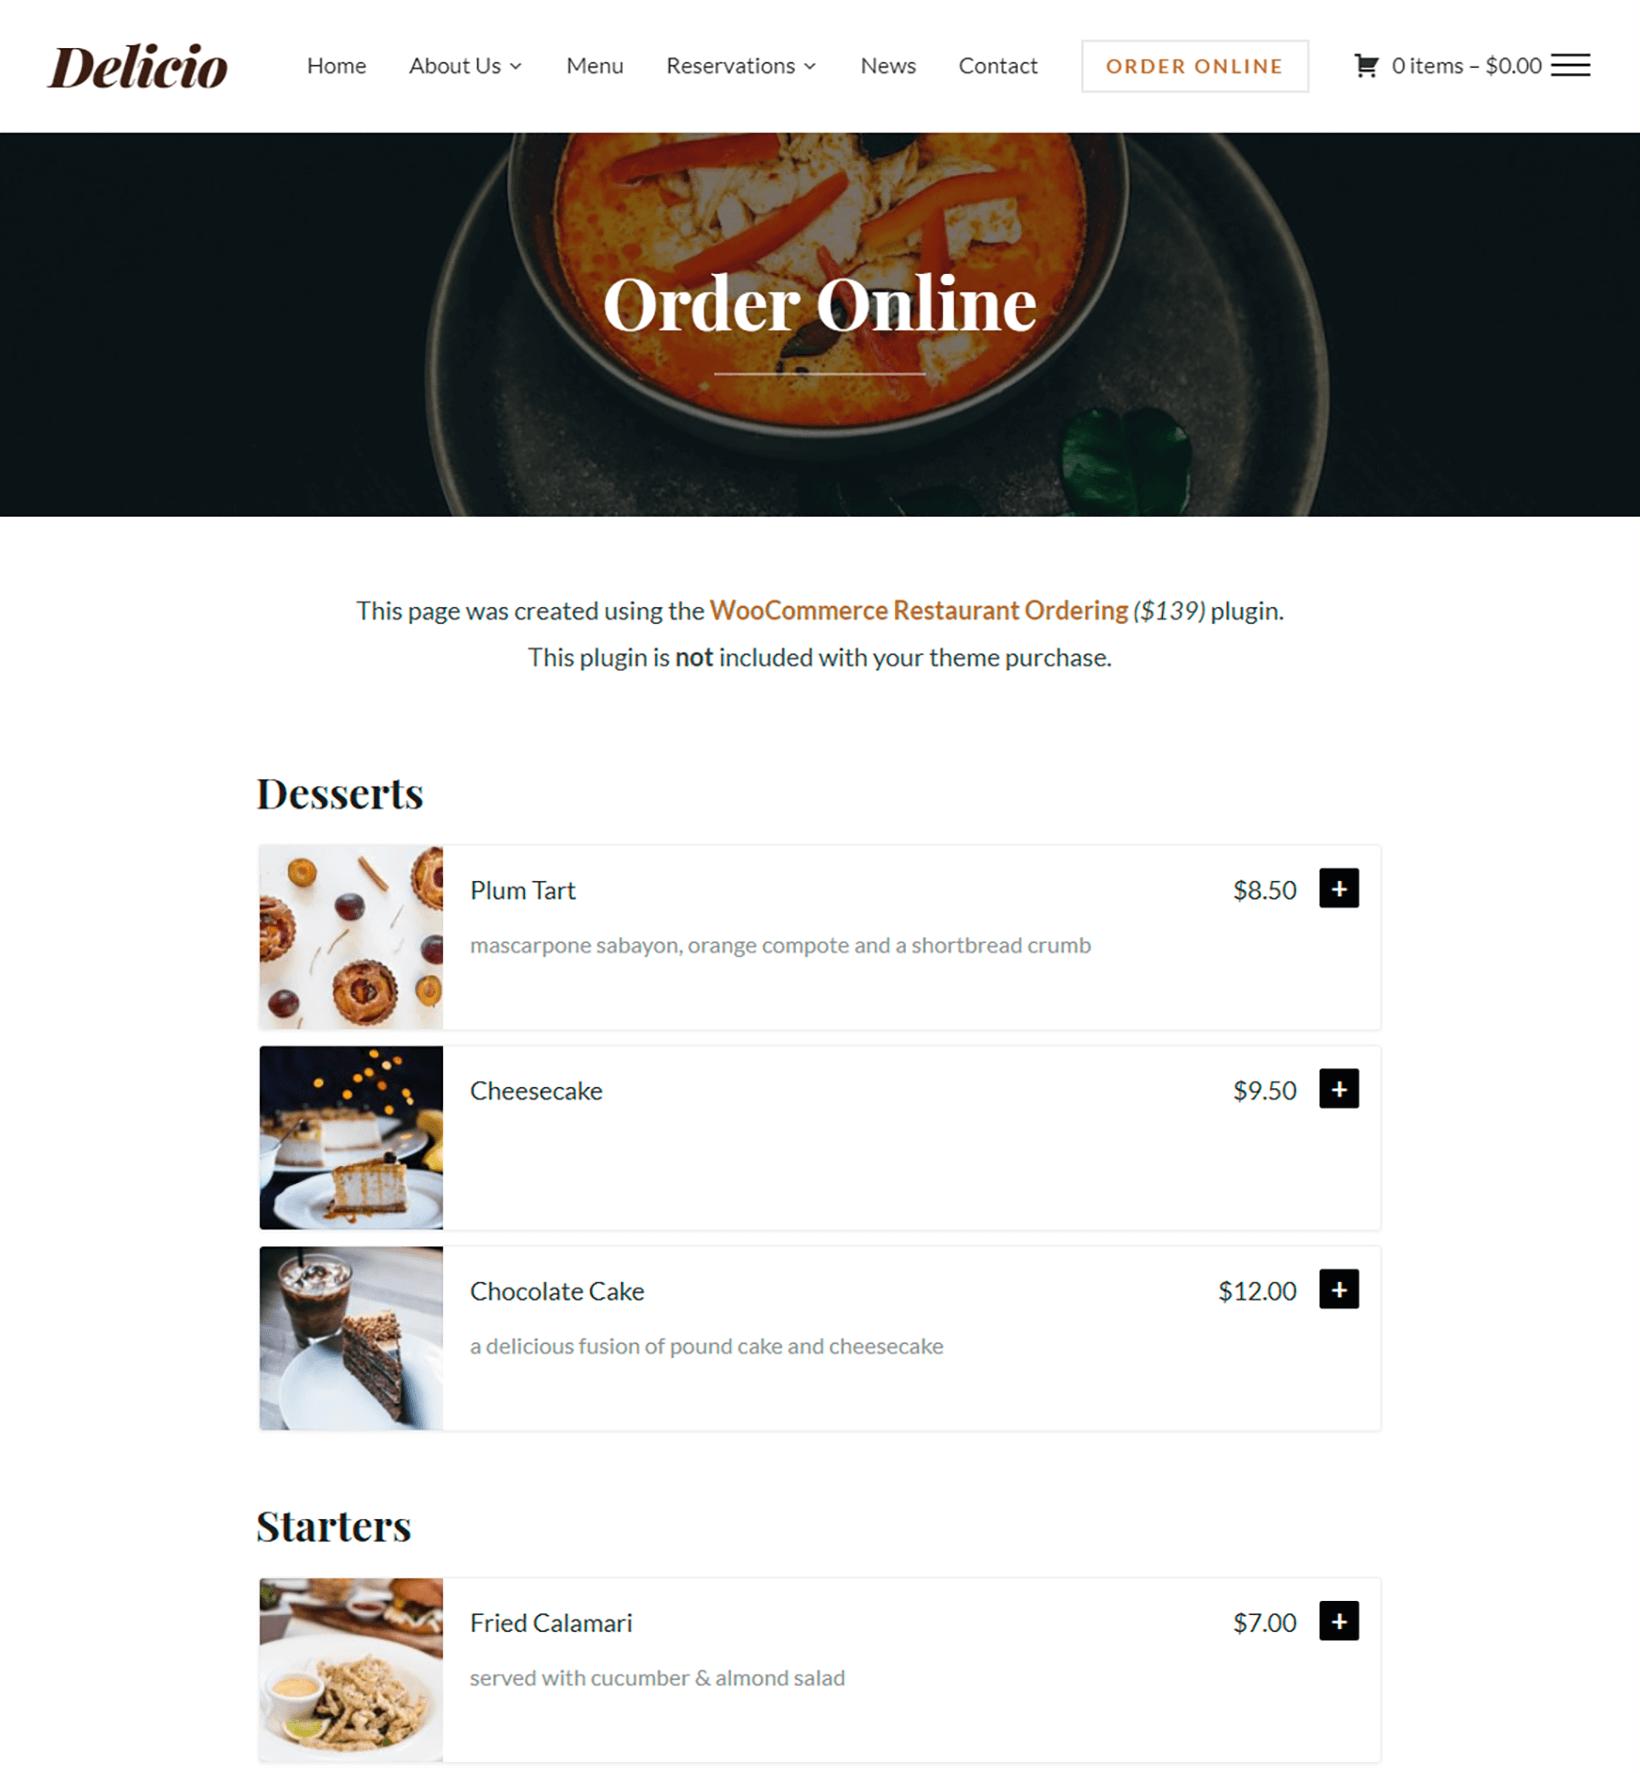 Delicio theme uses Woocommerce Restaurant Ordering plugin by Barn2